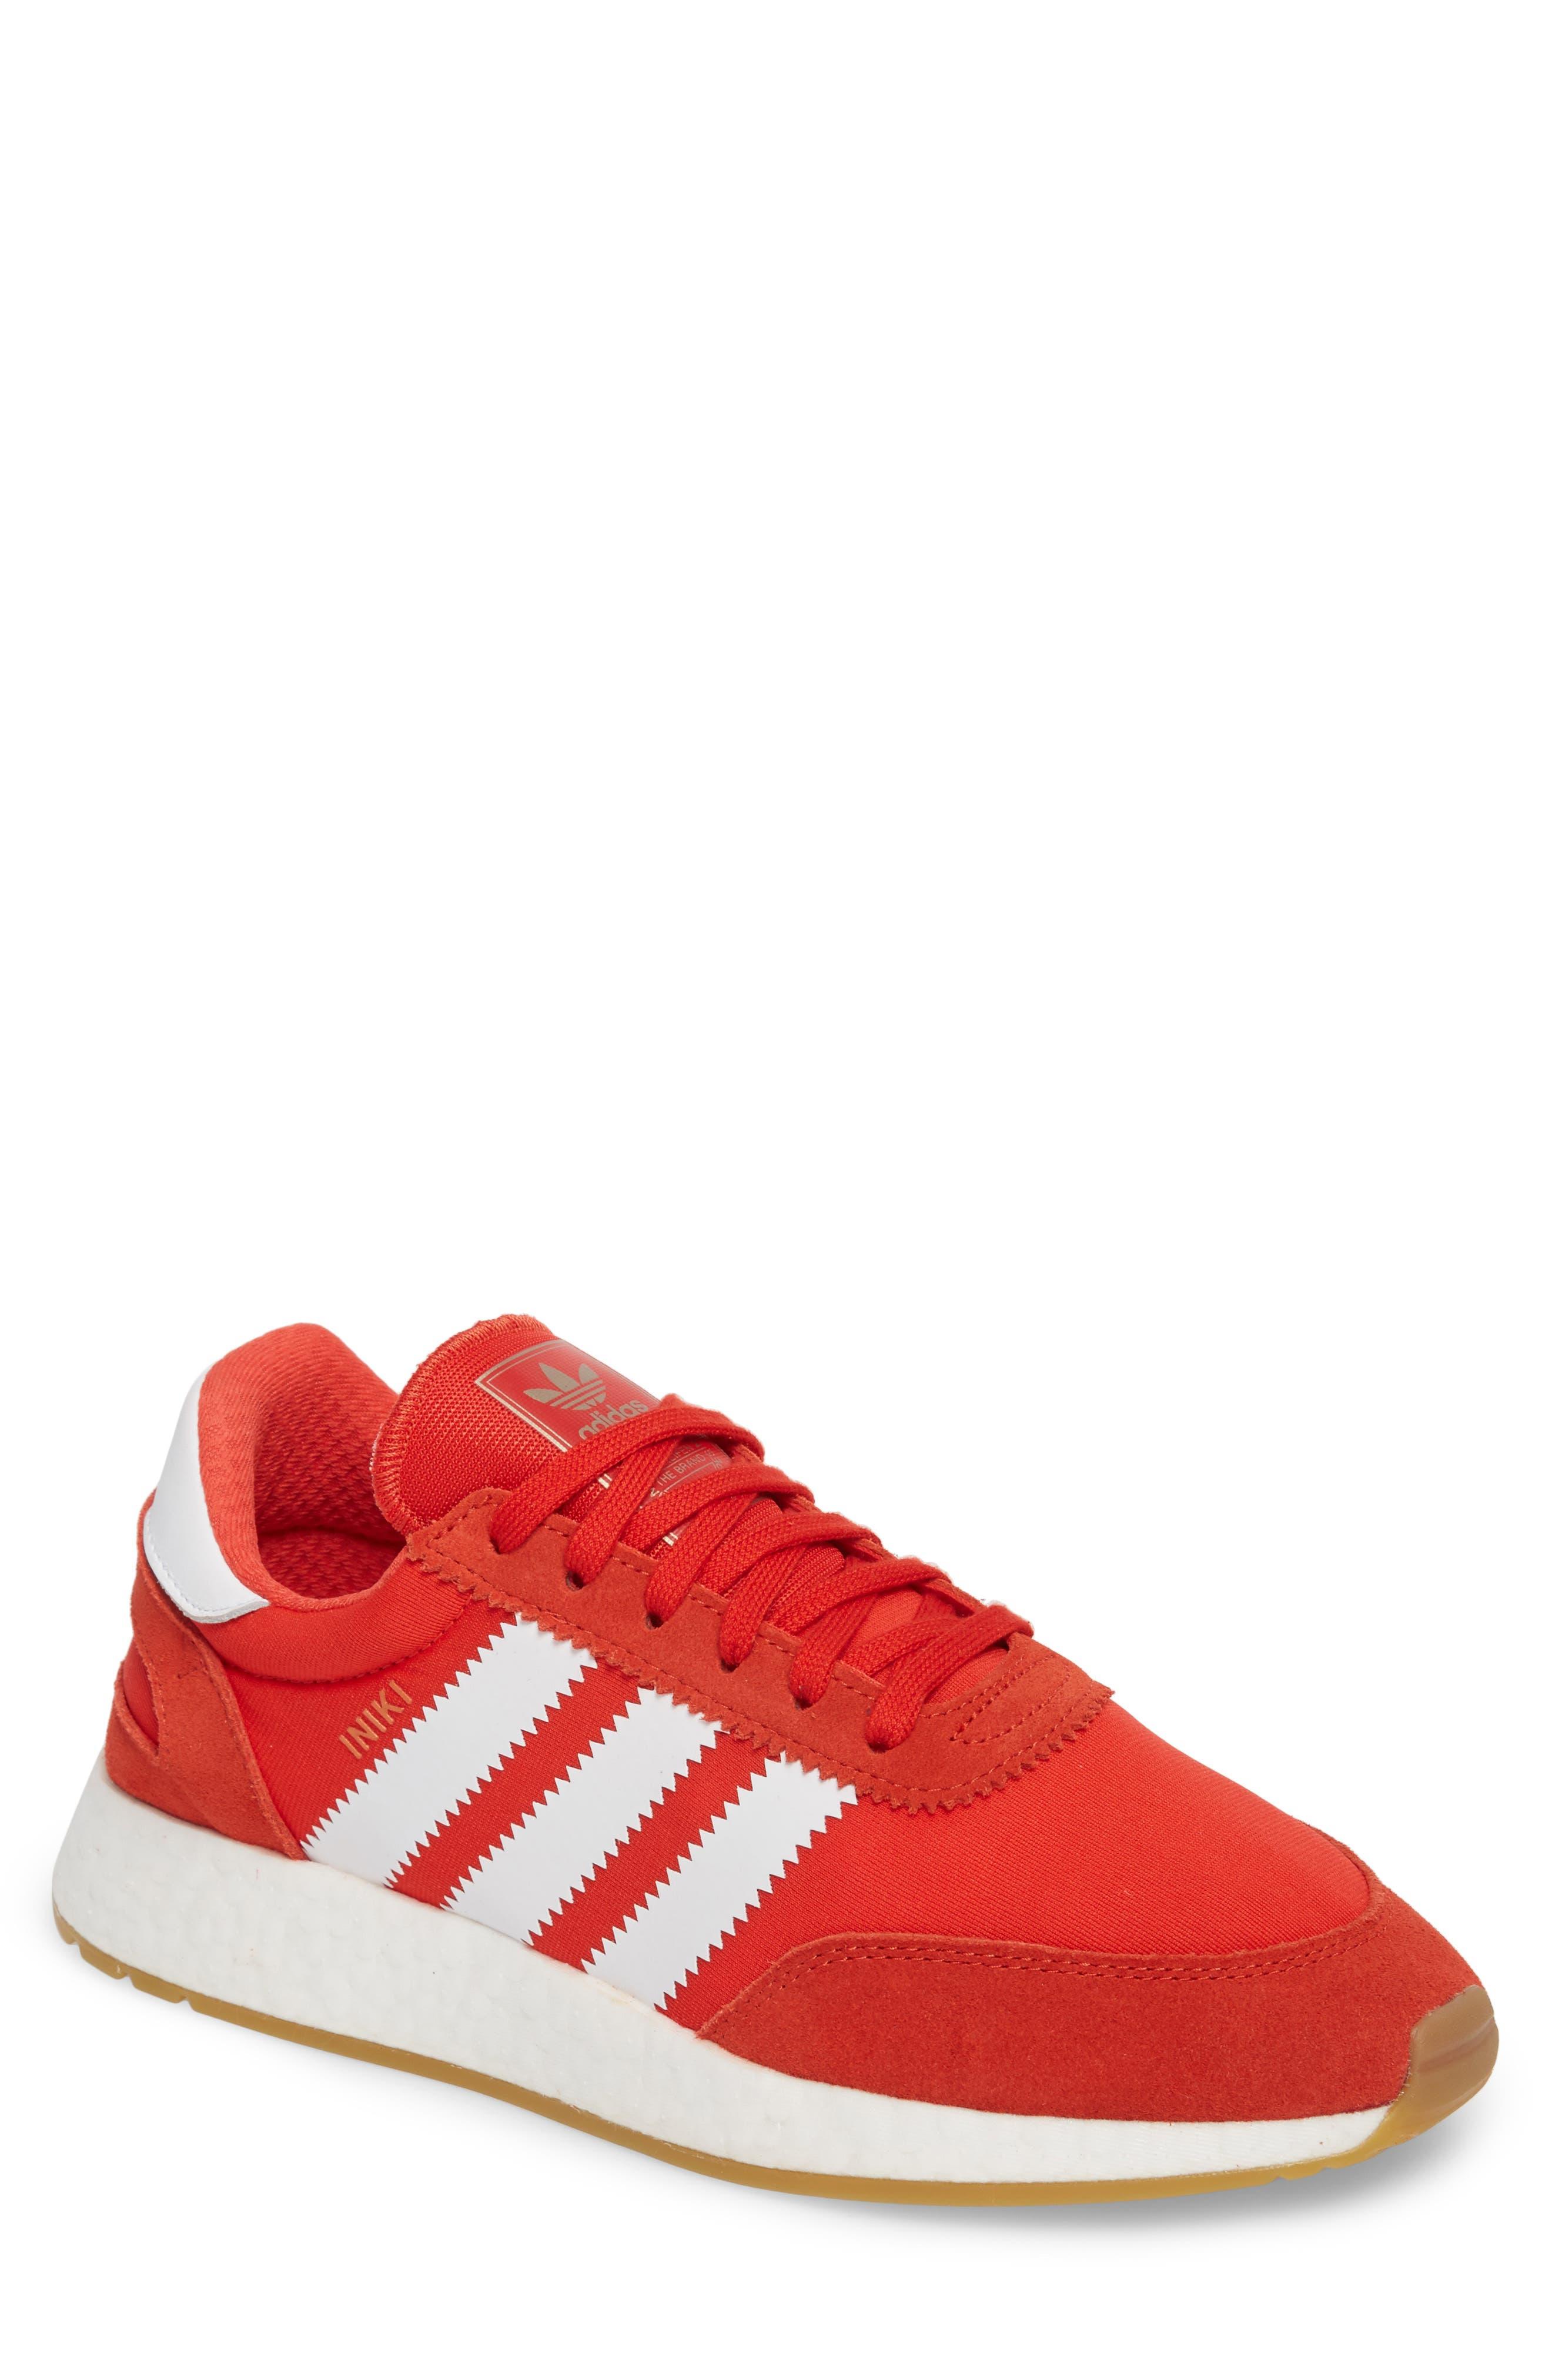 Iniki Running Shoe,                         Main,                         color, Red/ White/ Gum